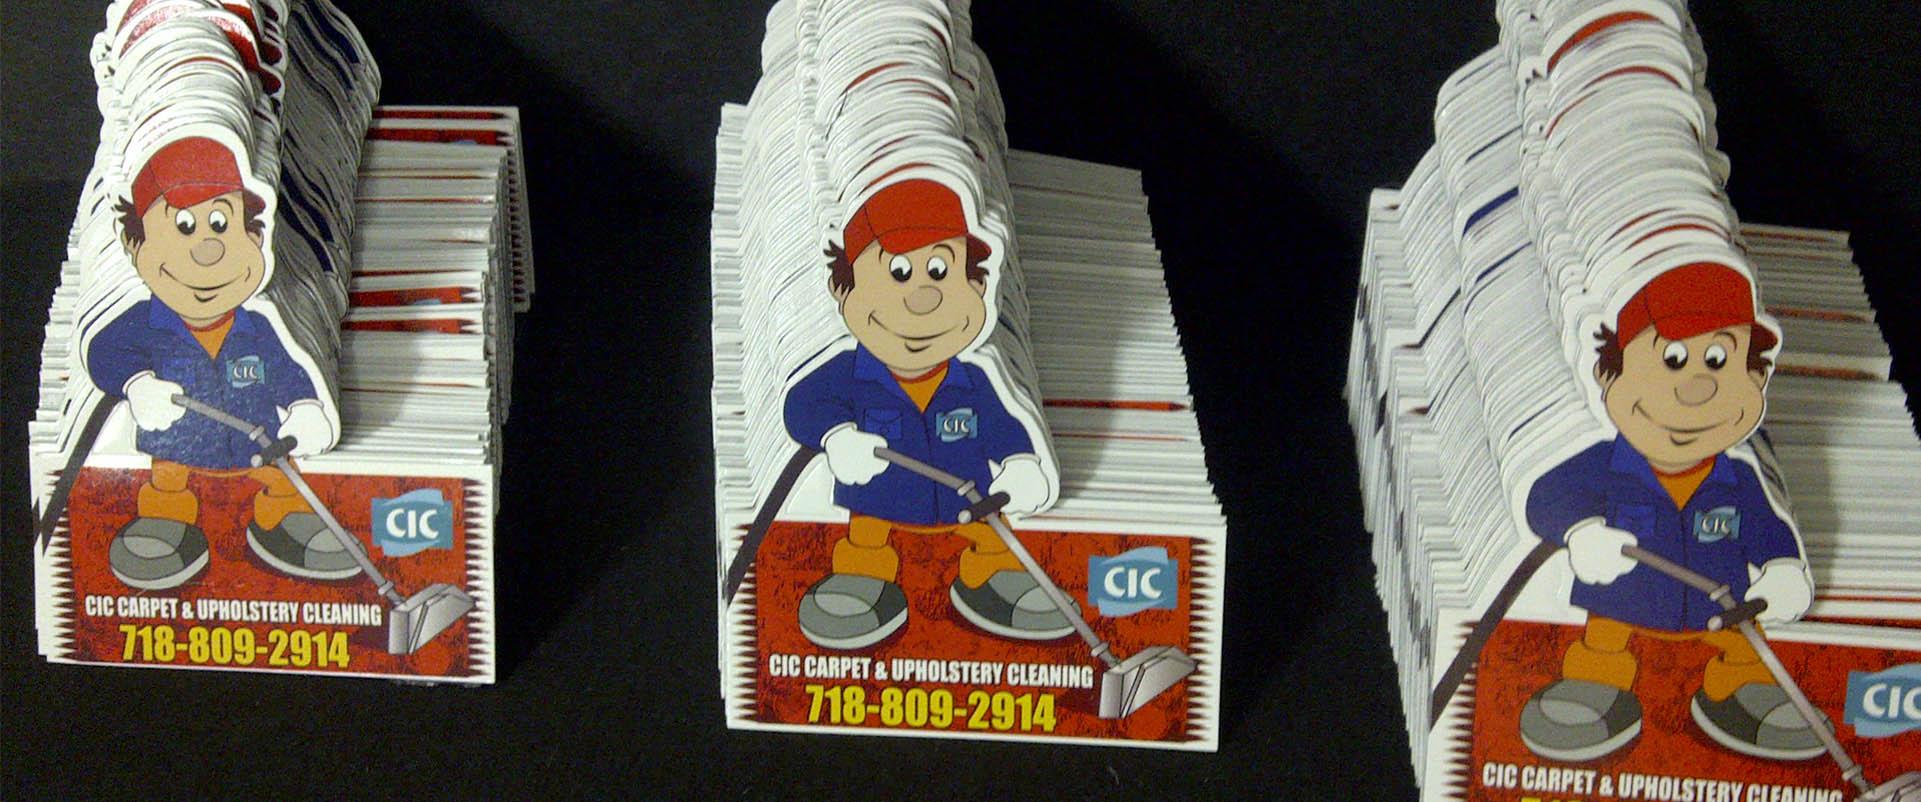 Business card magnet creator print business card magnet colourmoves